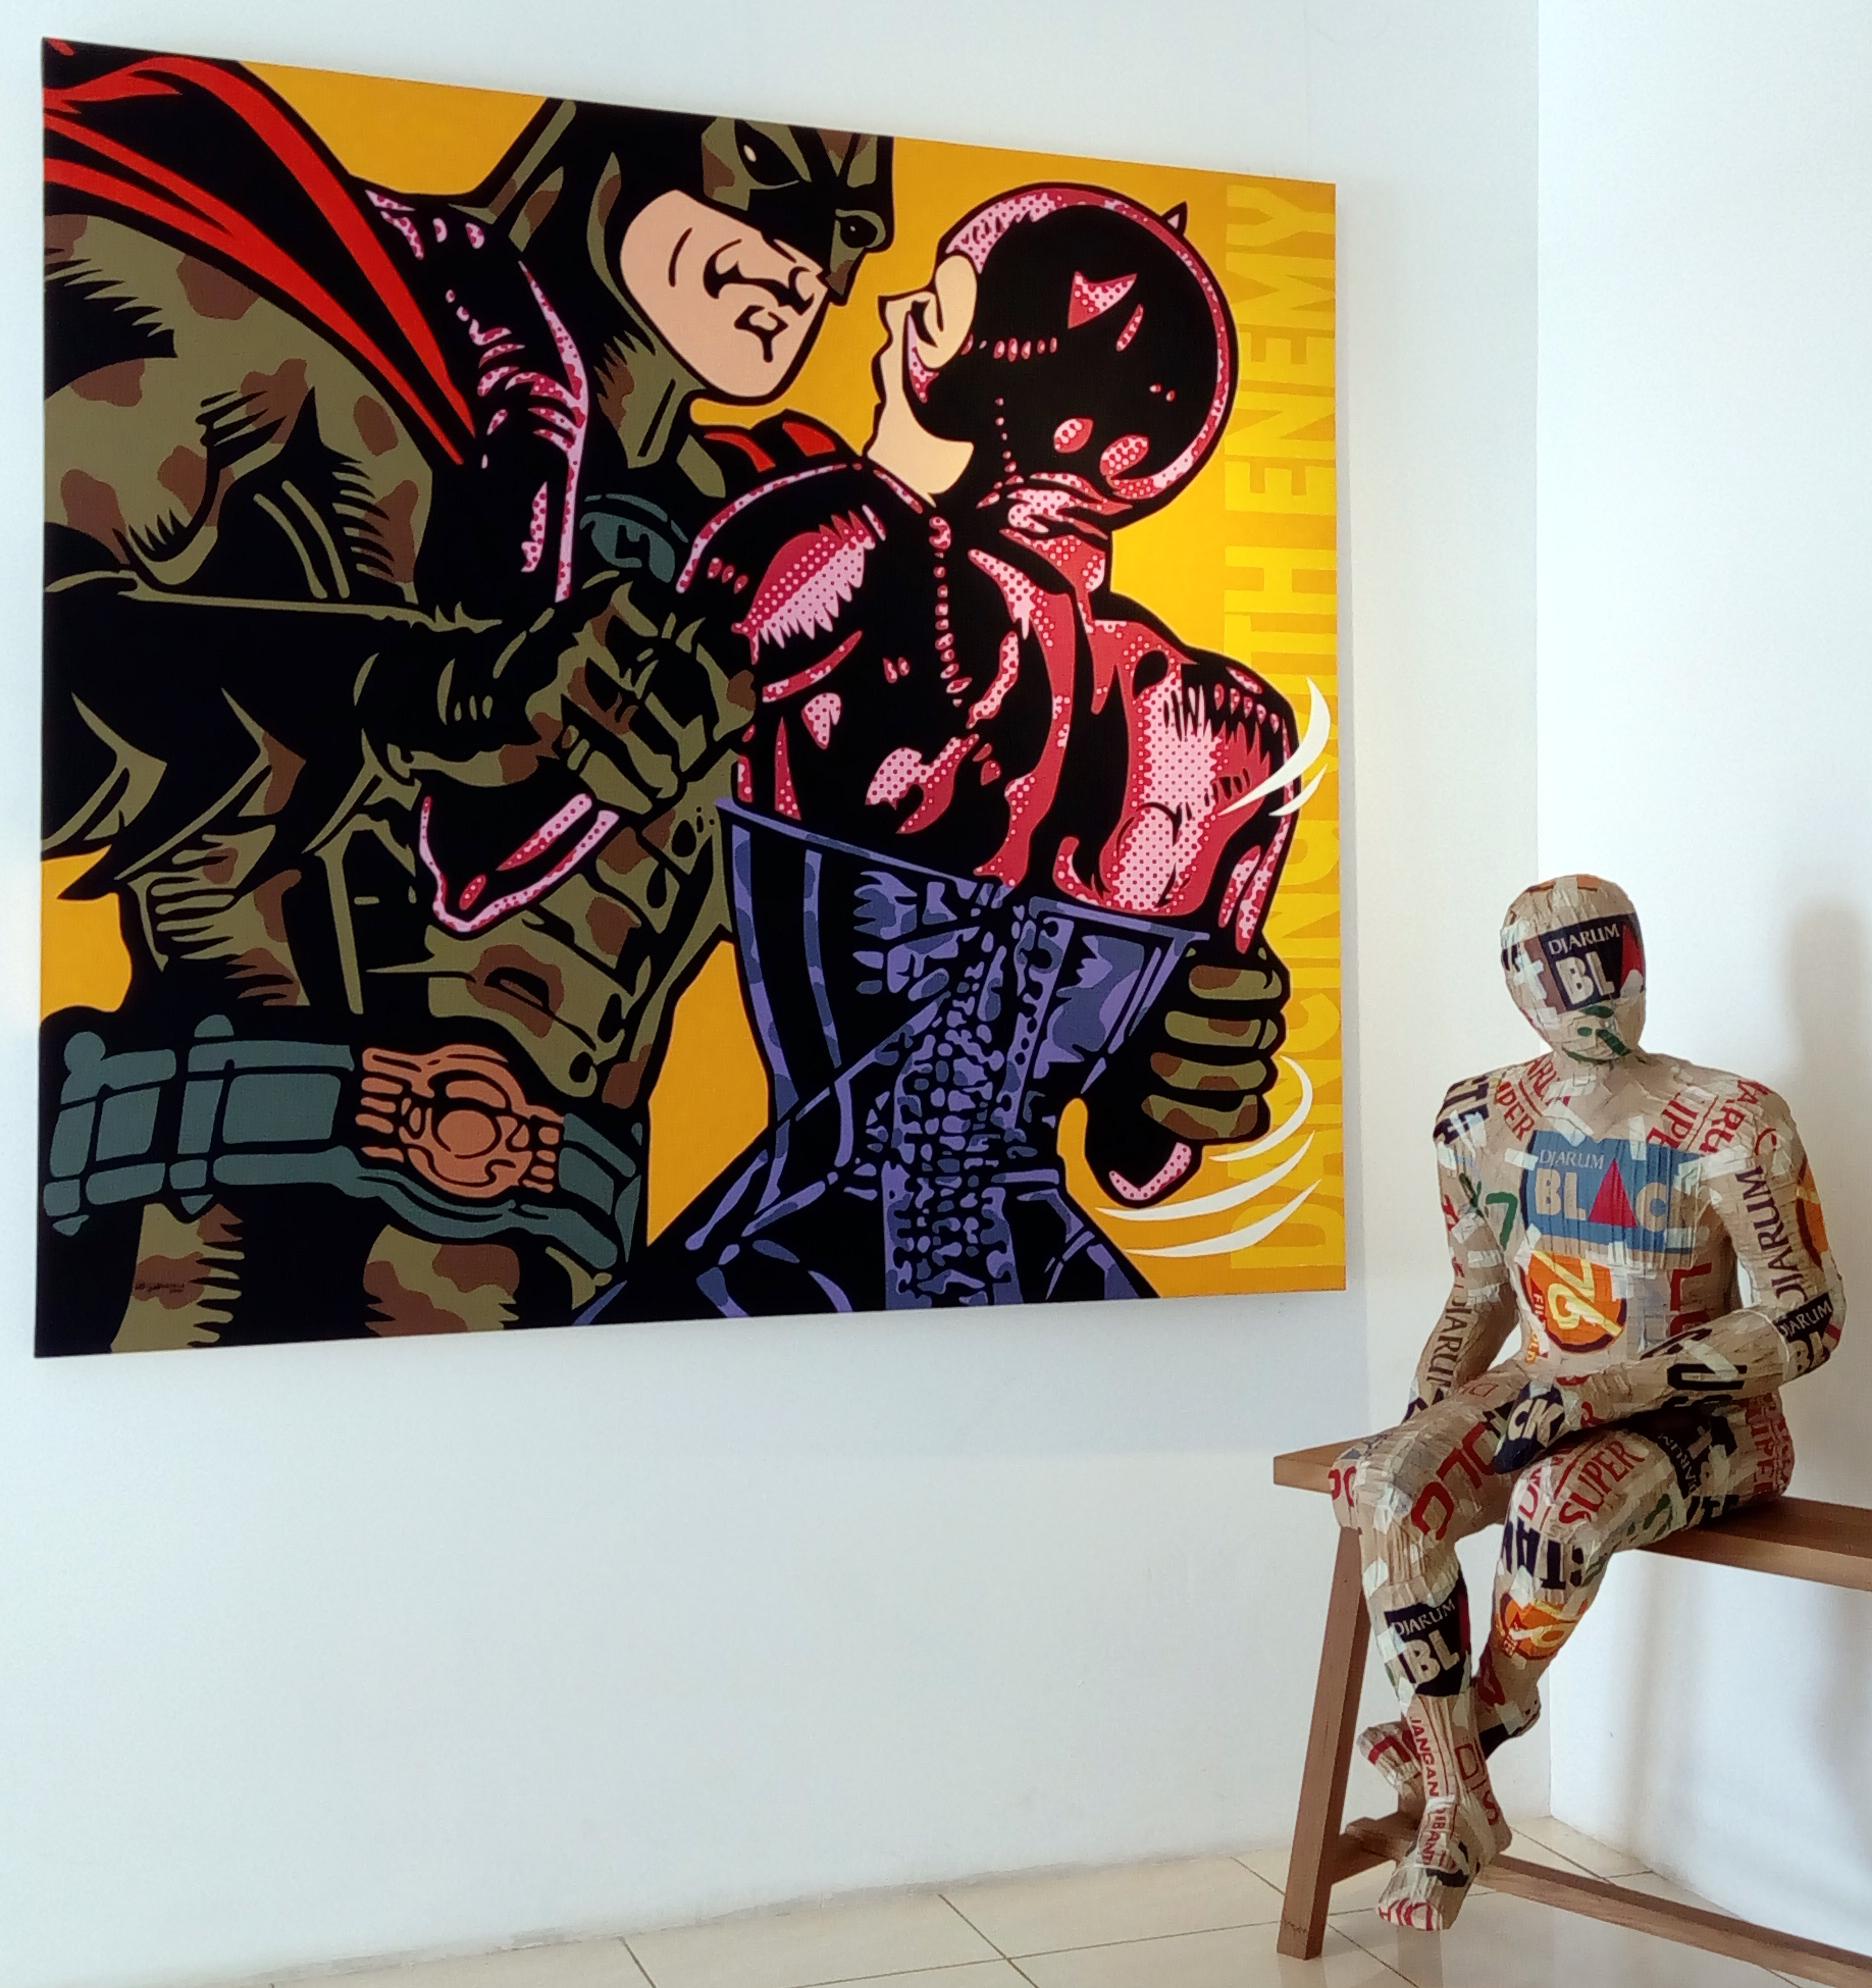 Patung karya Didi Kasi, 2013. (Foto: Silvia Galikano)